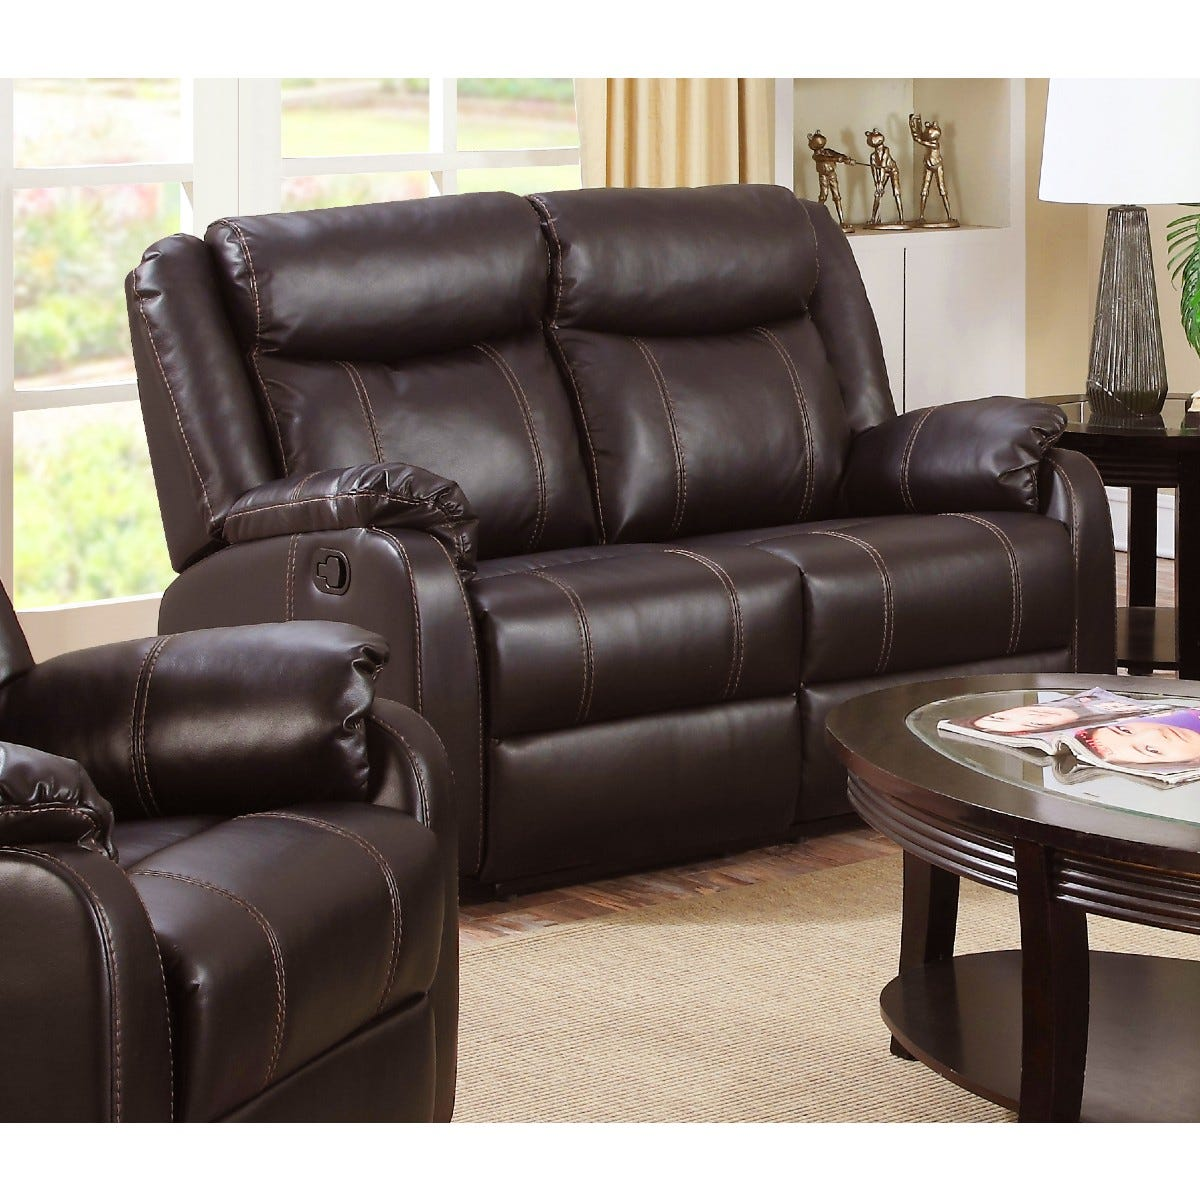 Ledbury Faux Leather Reclining 2 Seater Sofa Brown